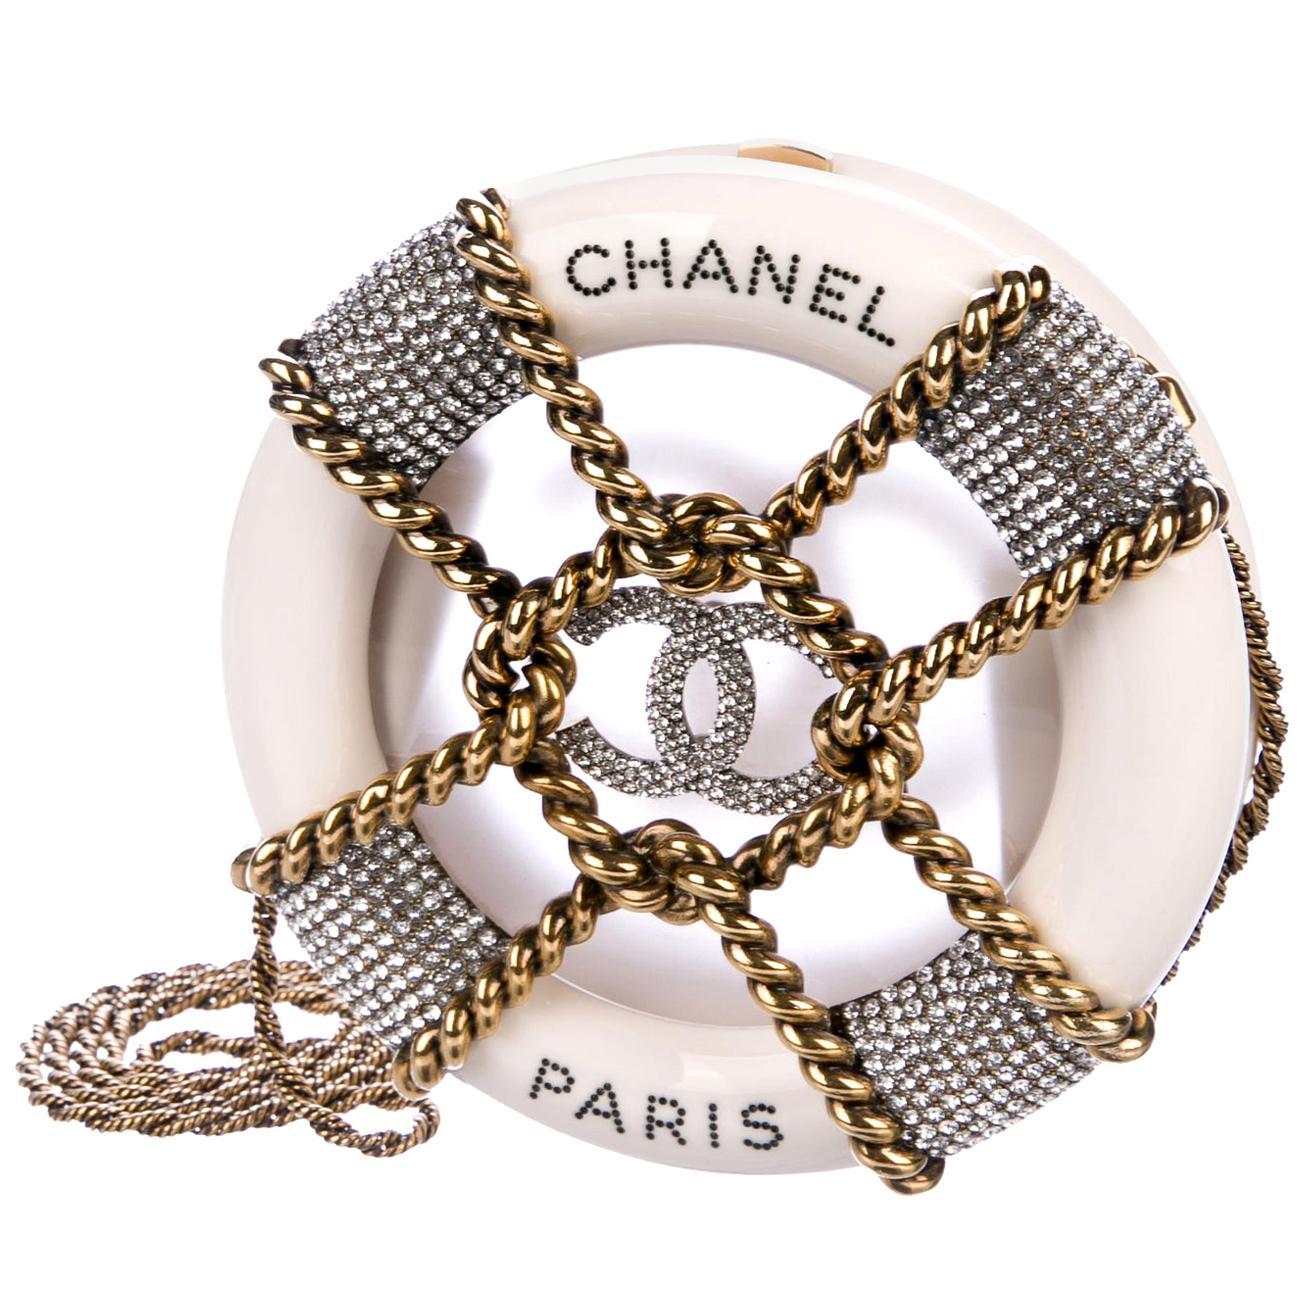 Chanel Runway Off White Crystal Gold Round Evening Clutch Shoulder Bag